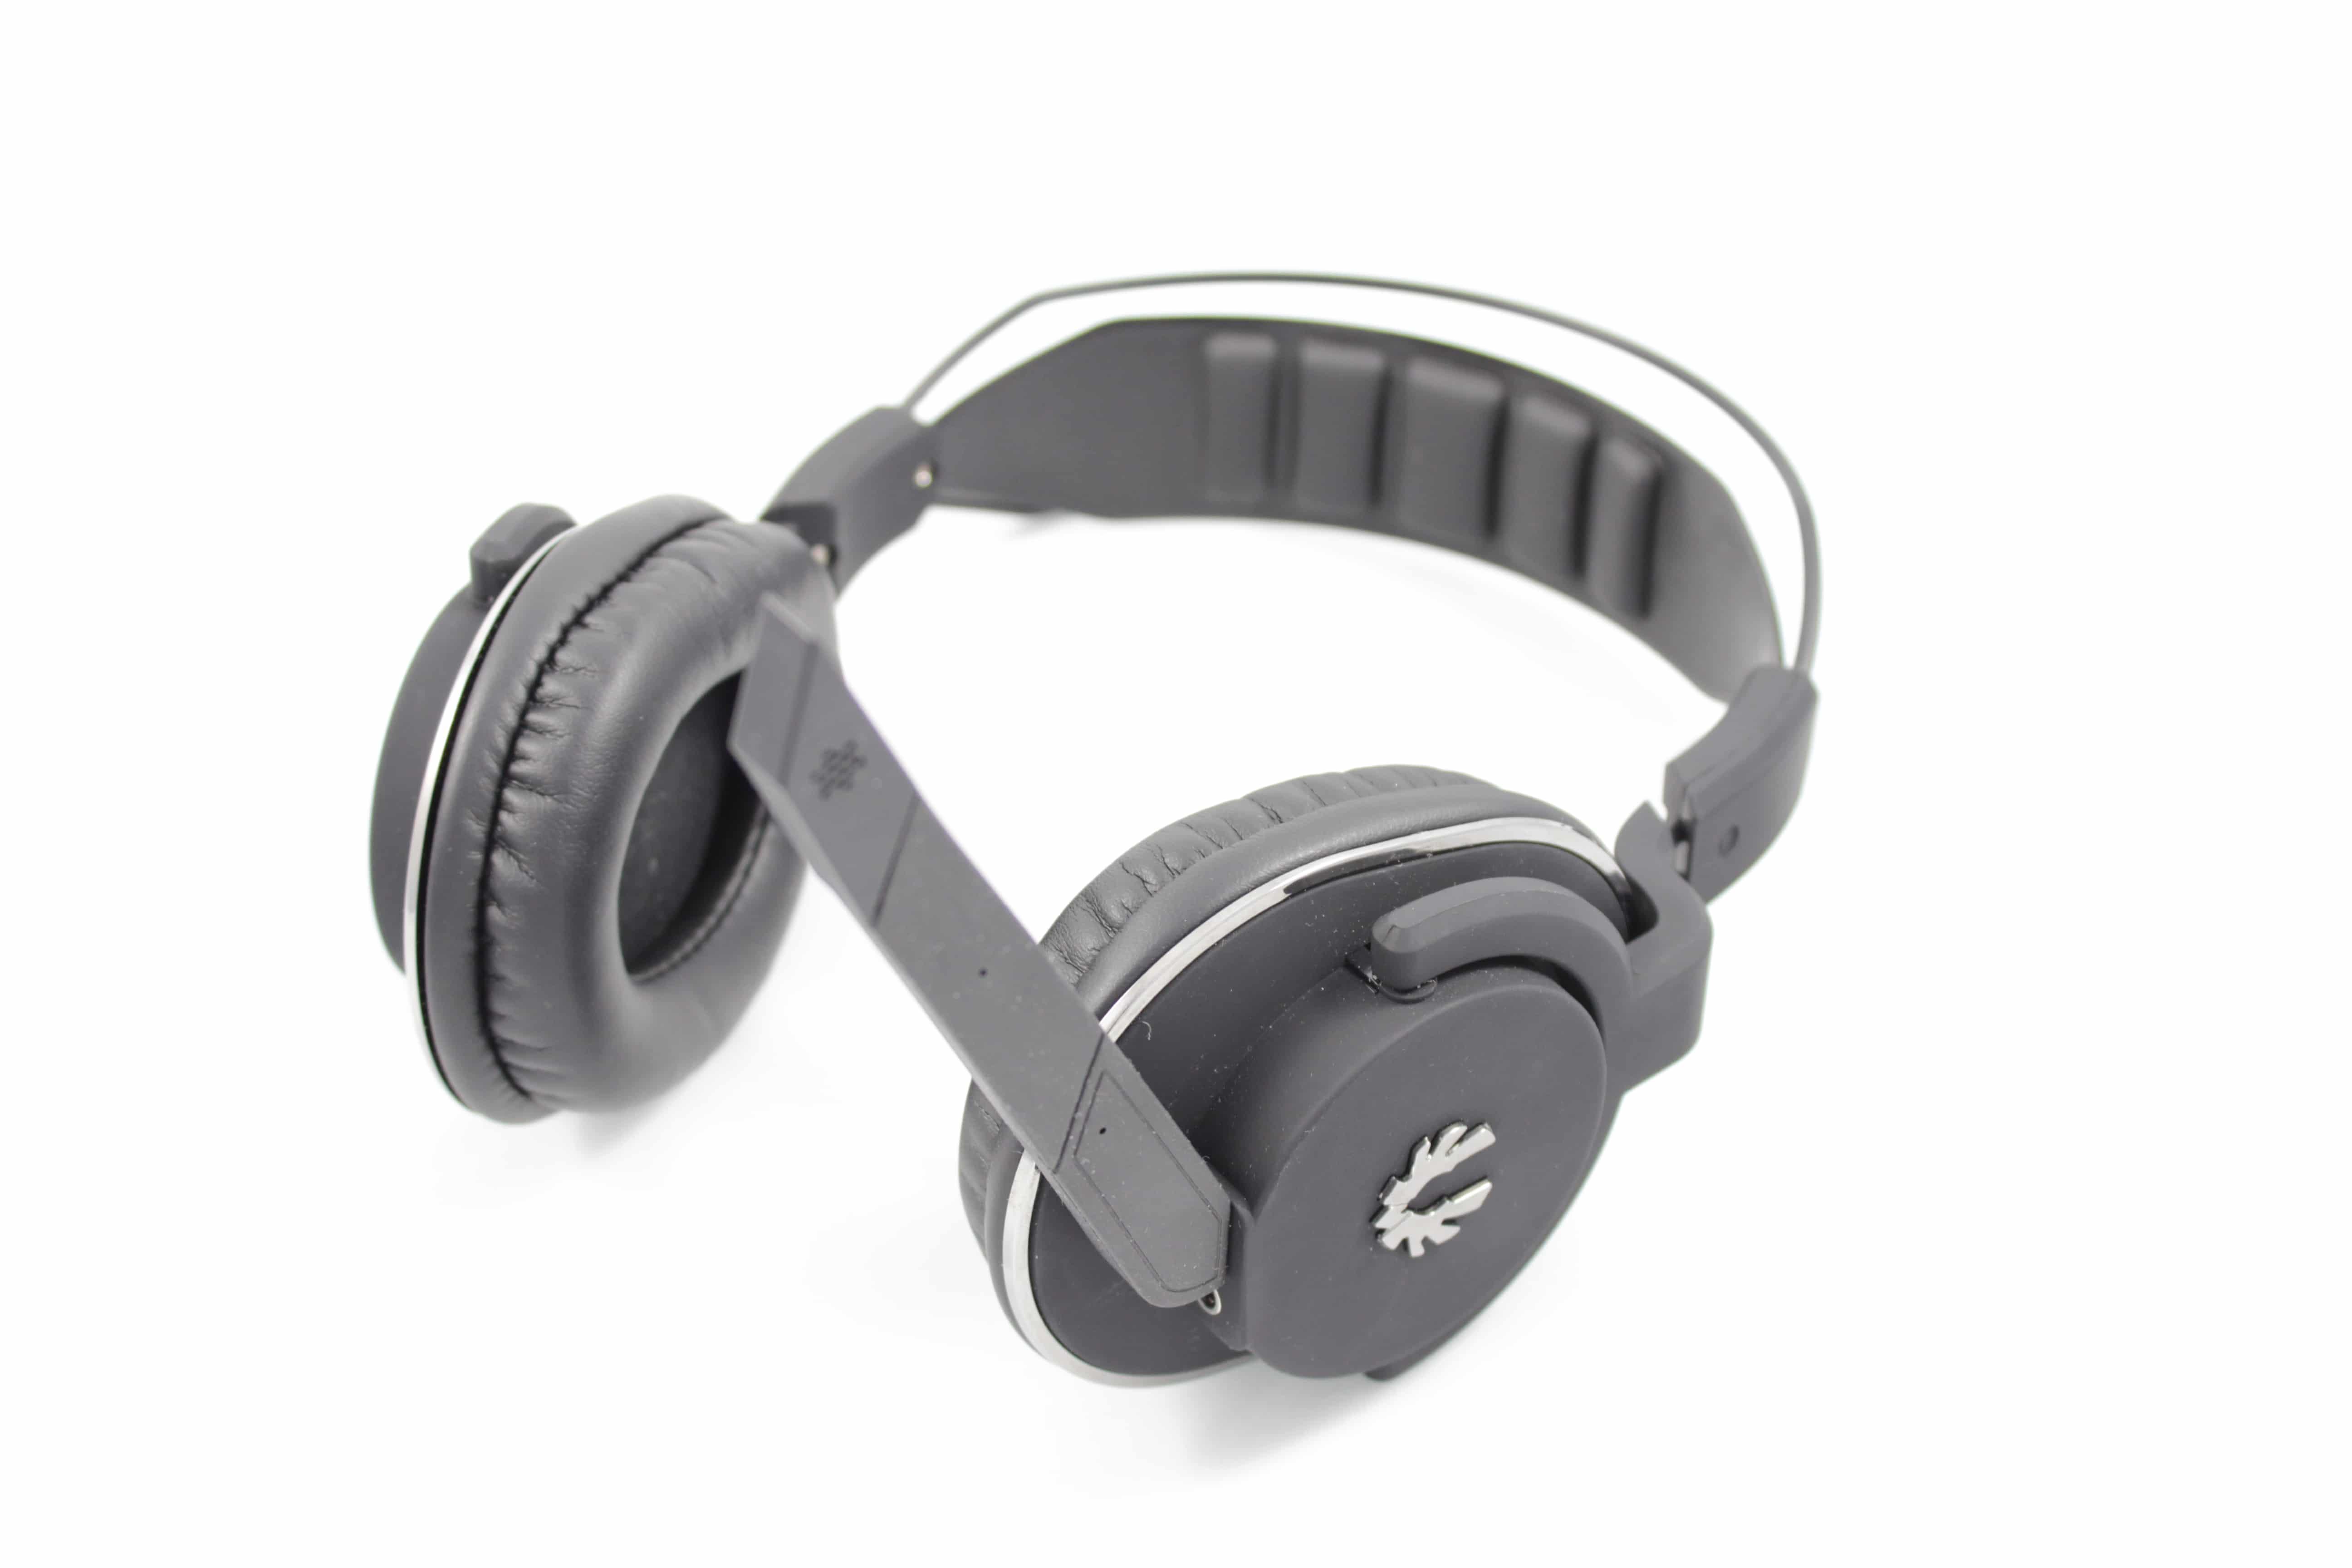 Photo of Testbericht: BitFenix Flo Gaming-Headset